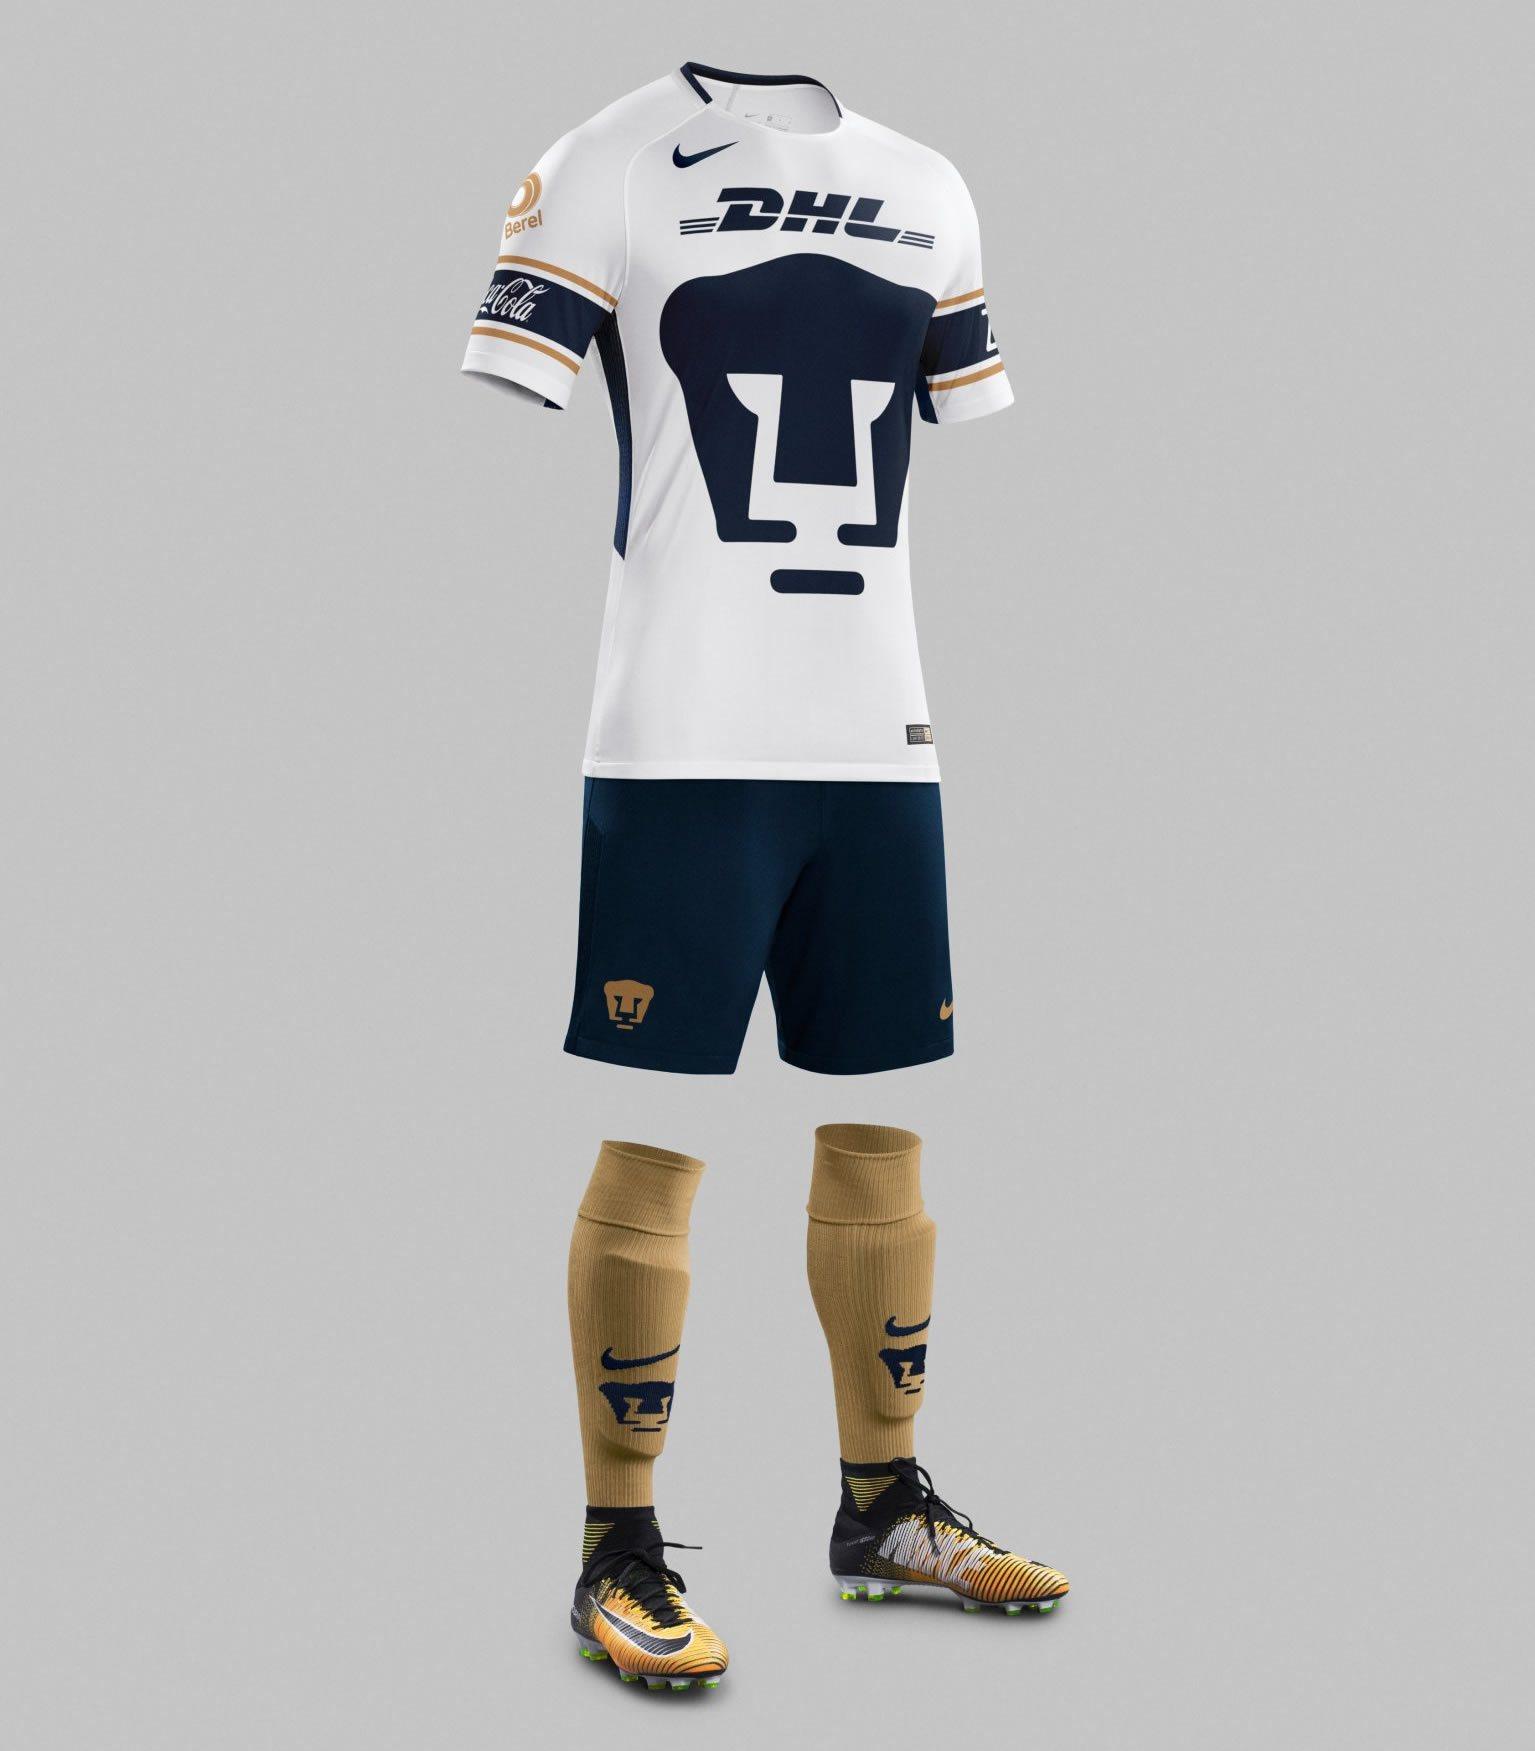 5e2016ed1 Camiseta titular de los Pumas UNAM   Foto Twitter Oficial